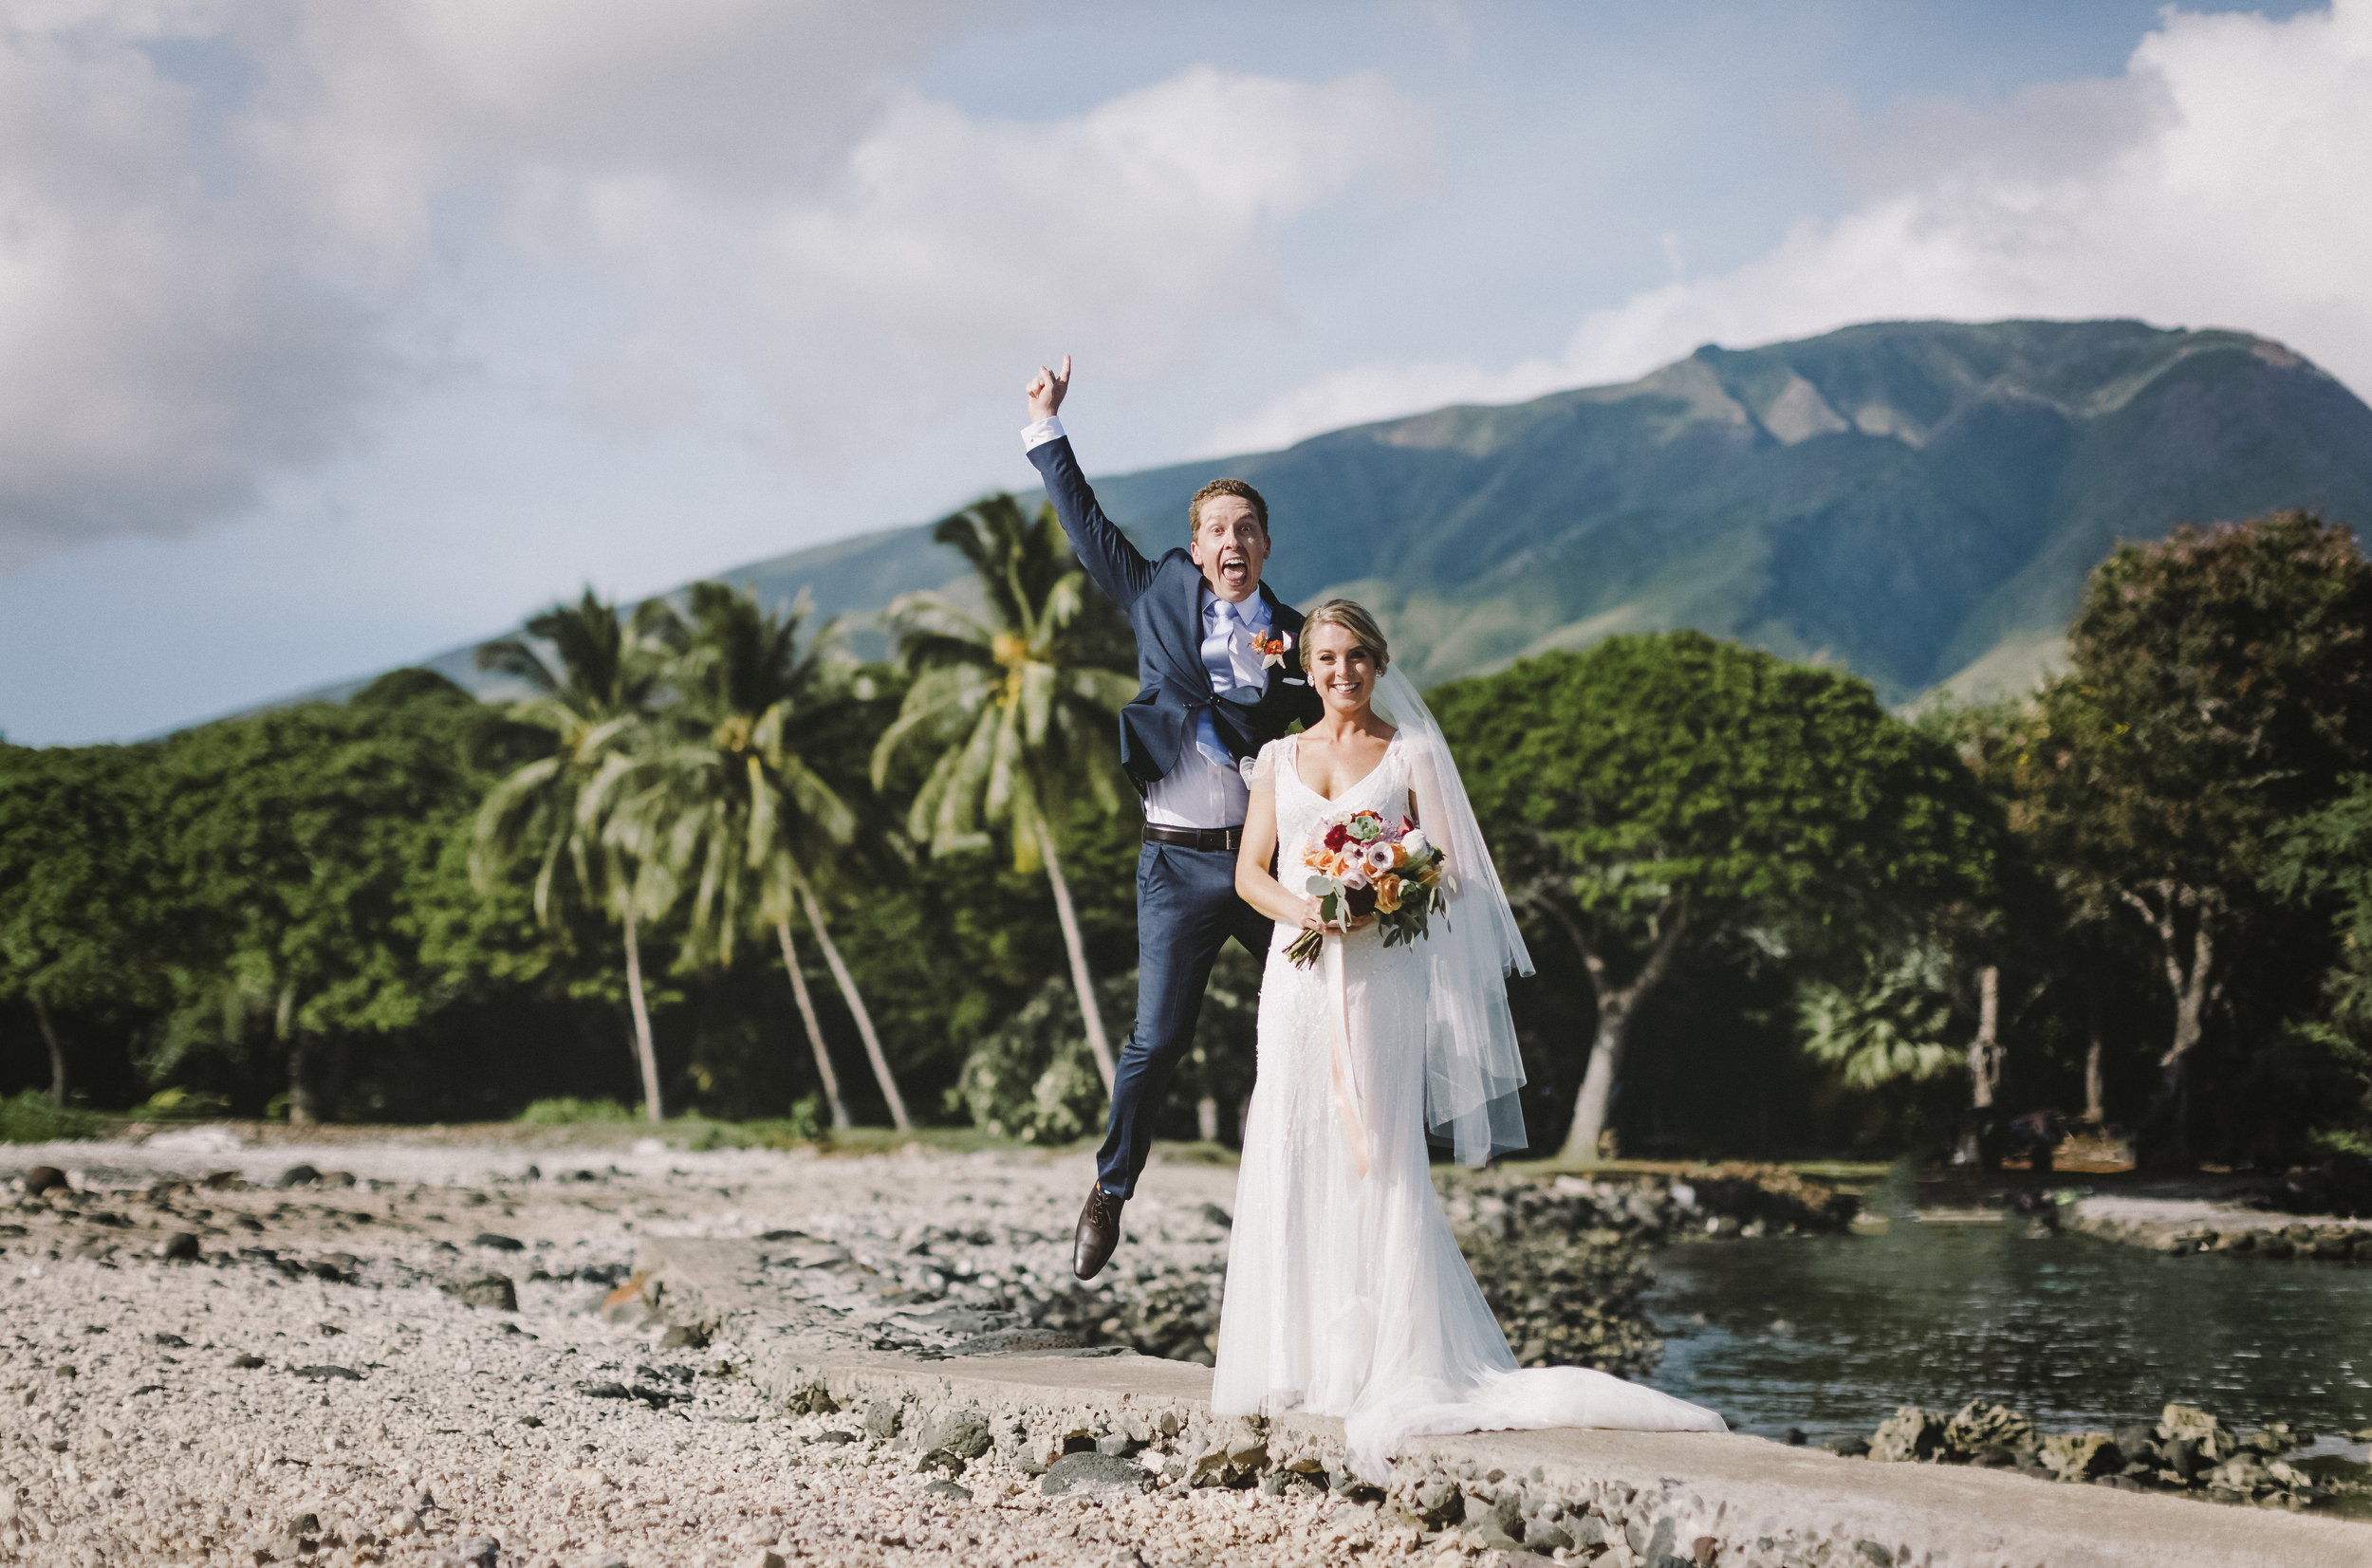 angie-diaz-photography-maui-wedding-mel-matt- 74.jpeg